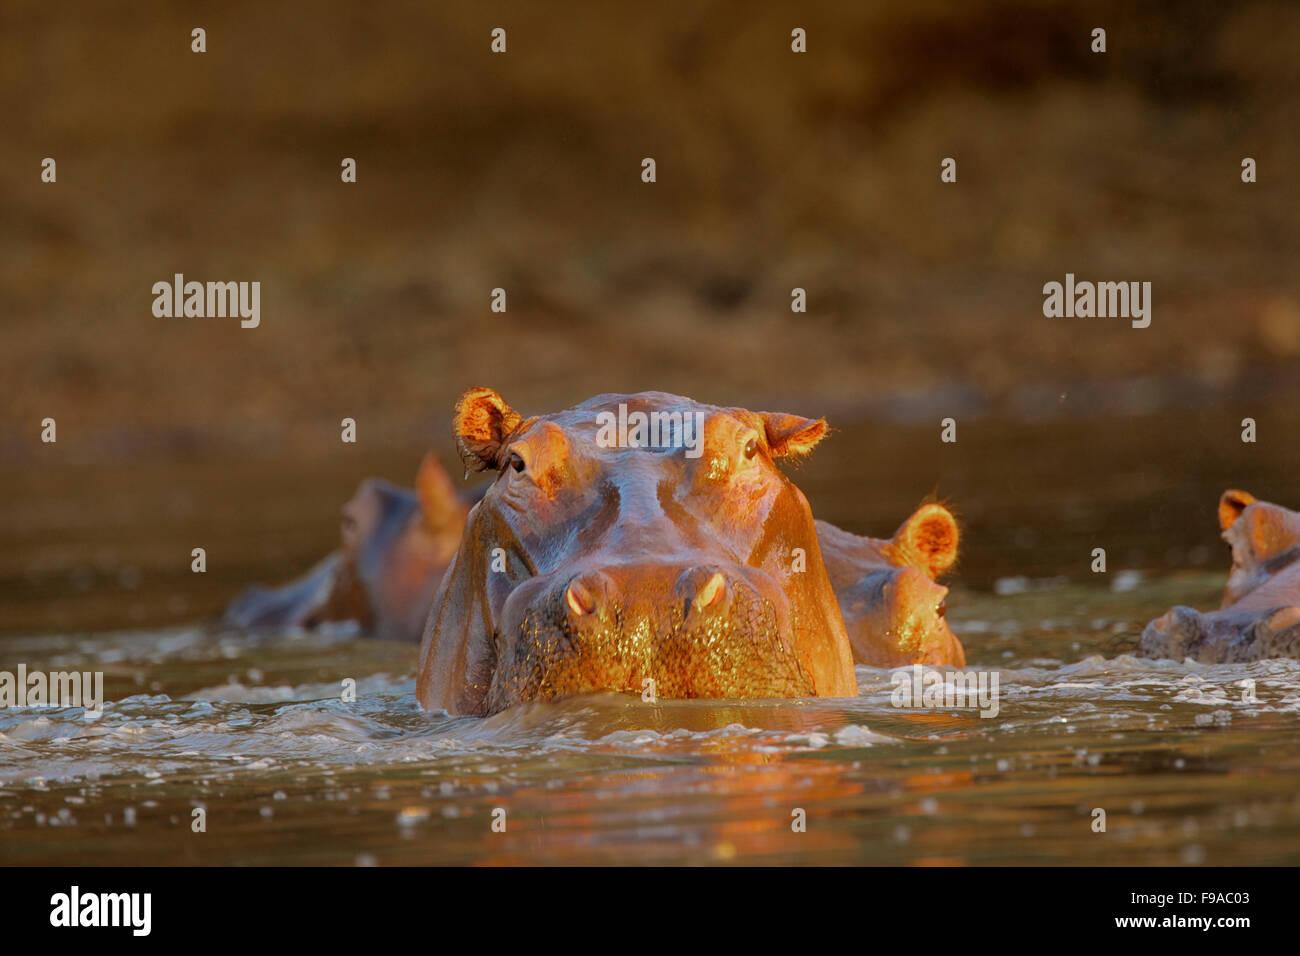 Hipopótamos, Mana Pools, Zimbabwe Imagen De Stock